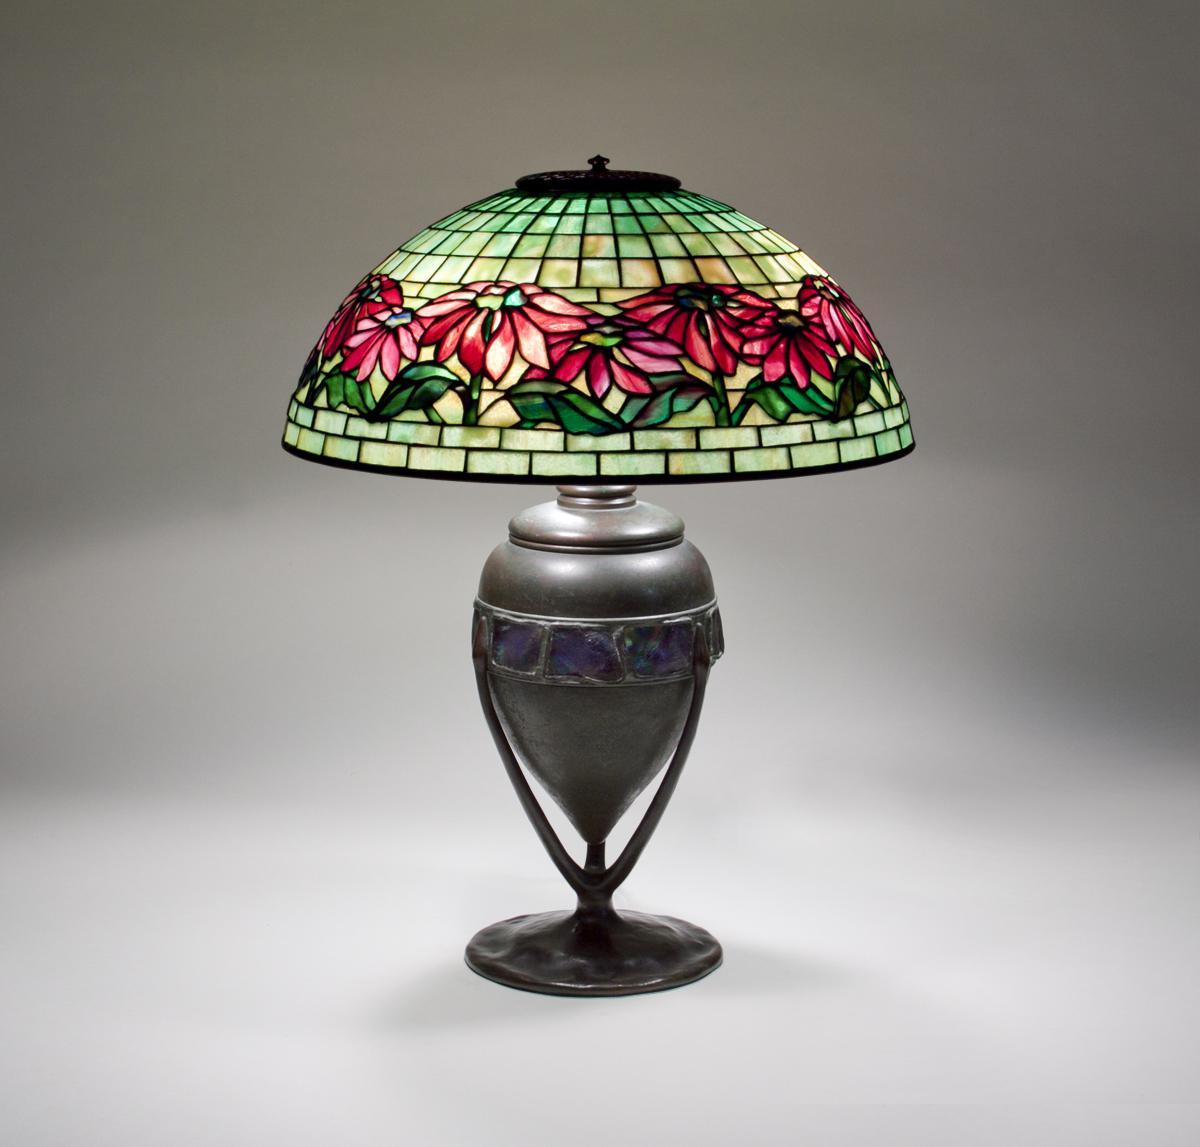 Tiffany Studios  Poinsettia Table Lamp 1